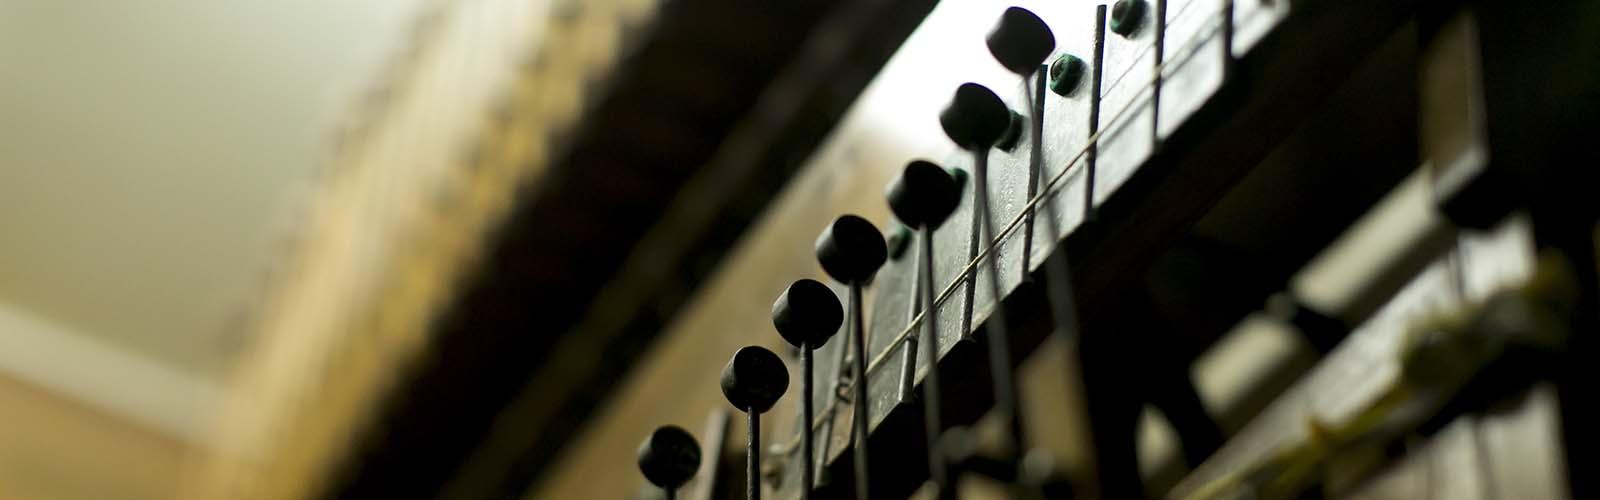 The Organ